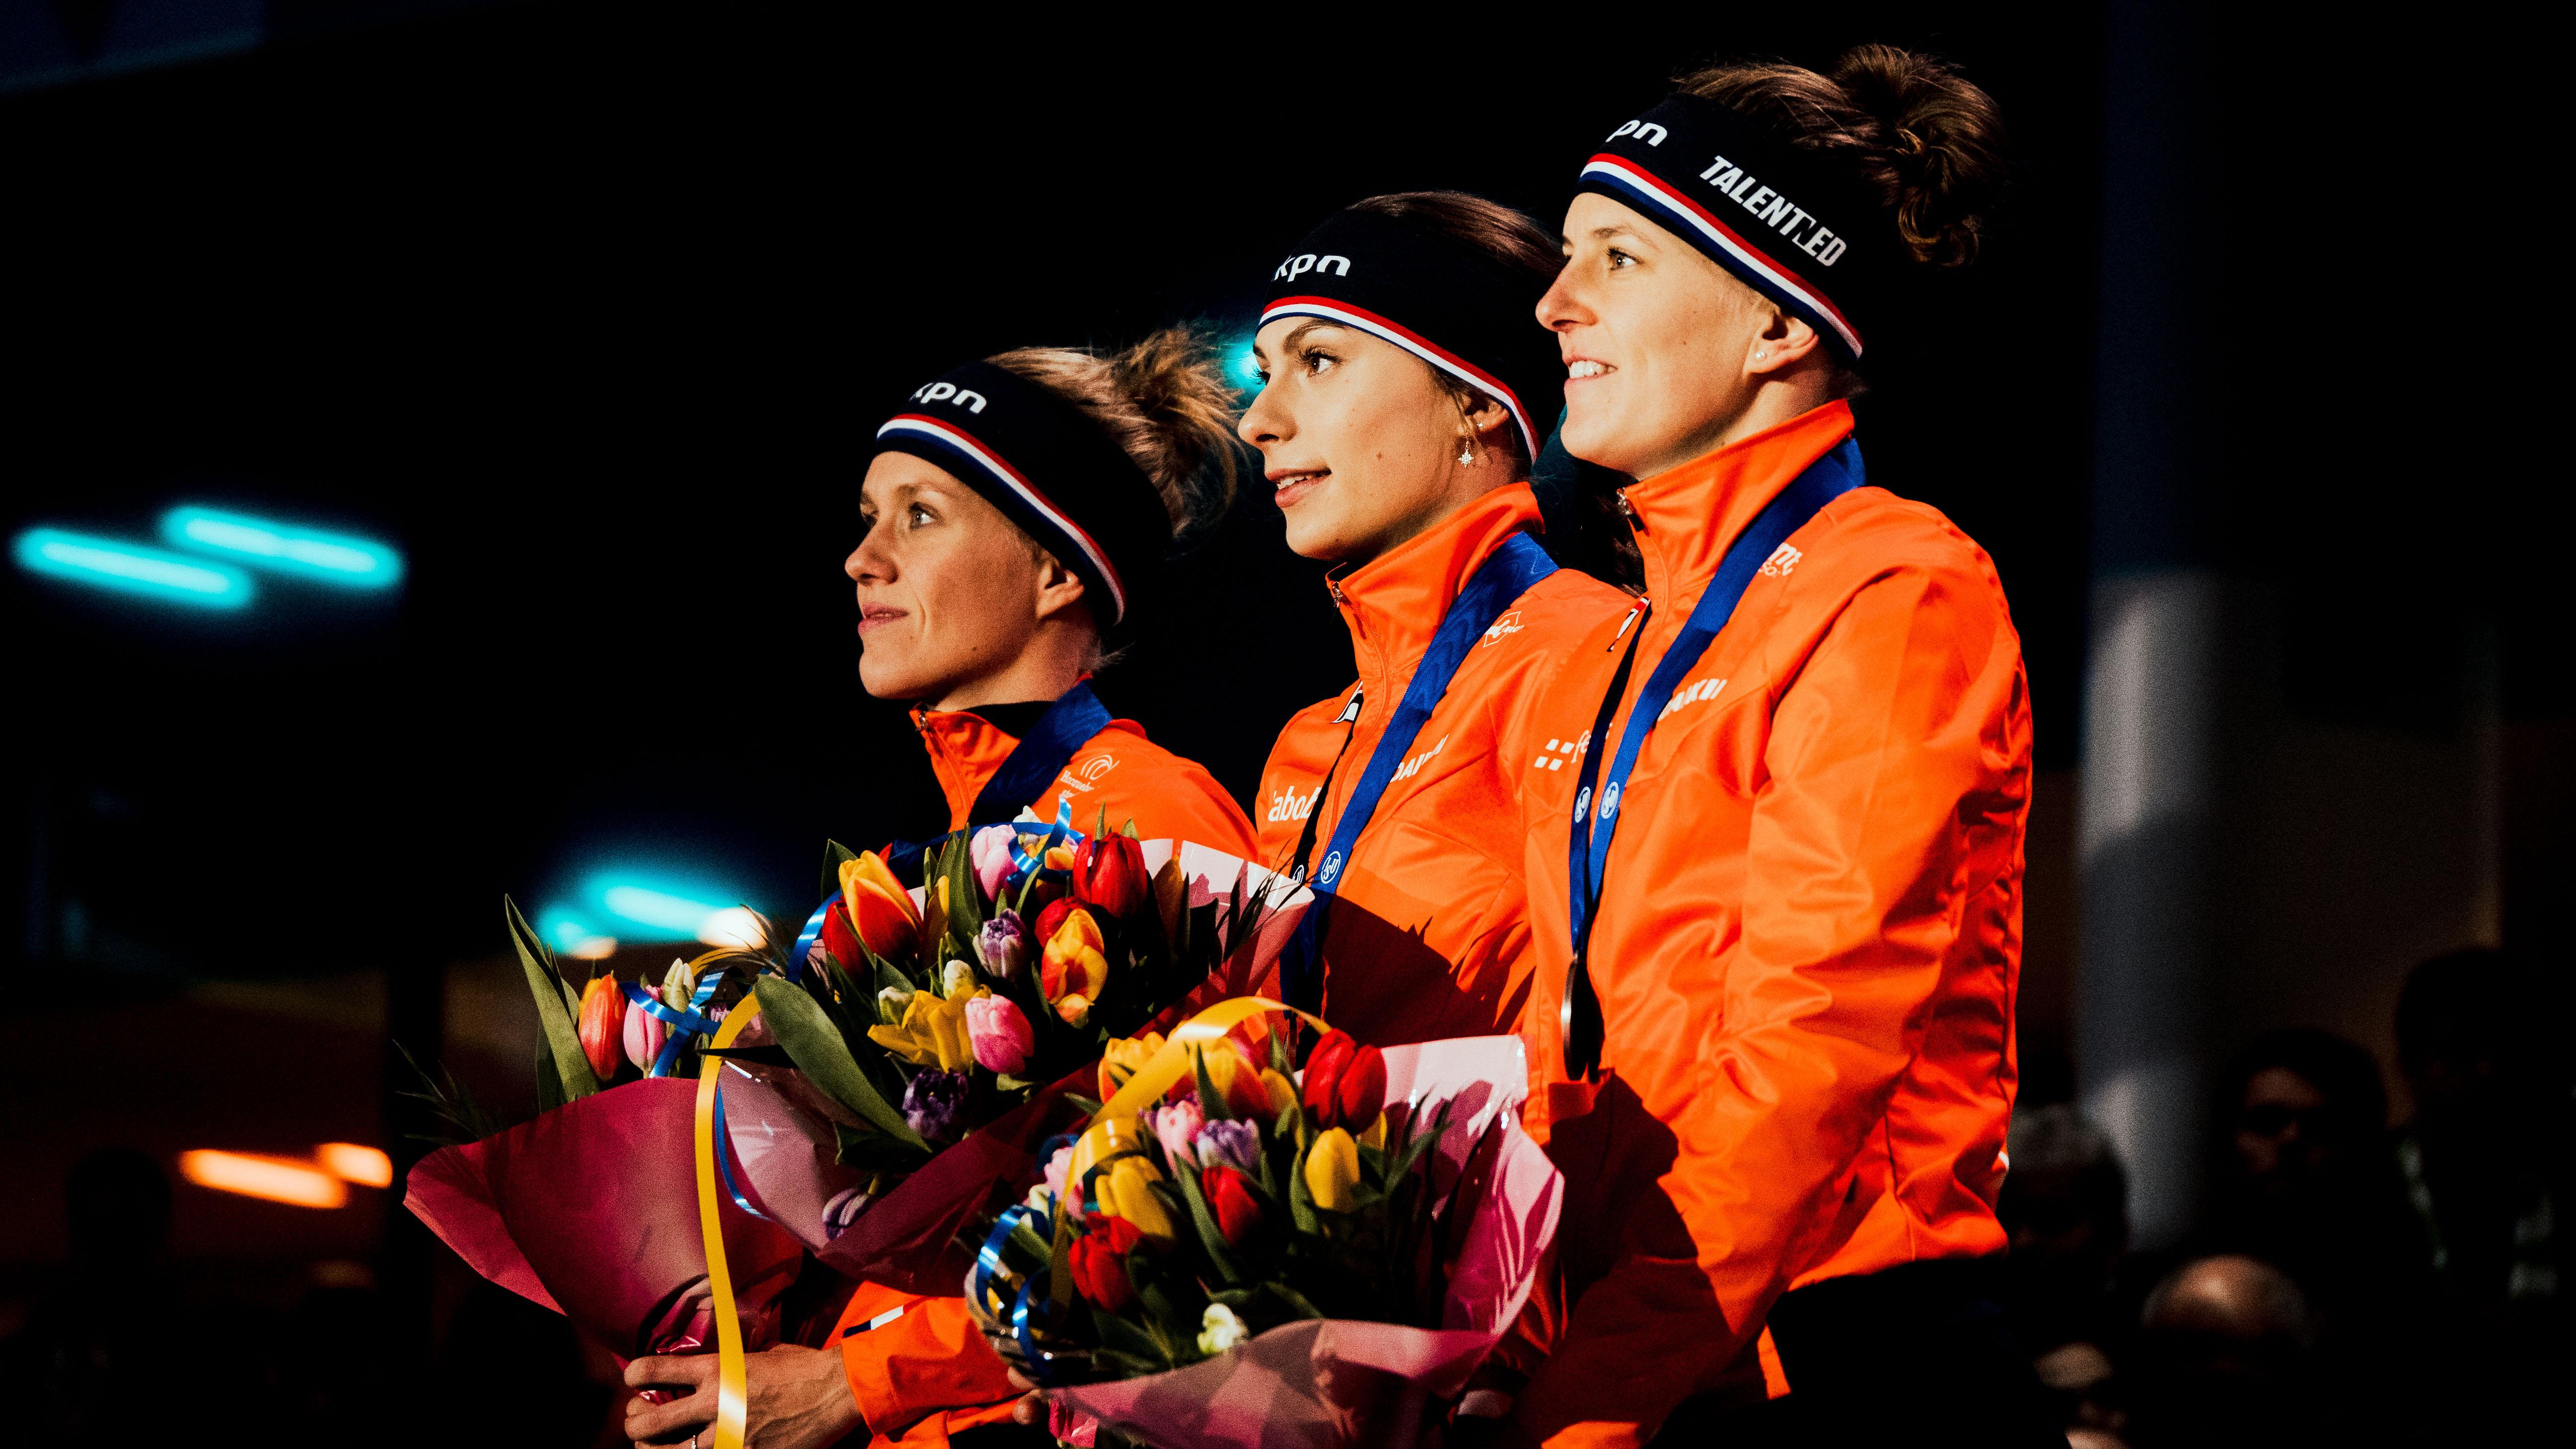 De Jong, Kok, Wust, ISU European Championships 2020